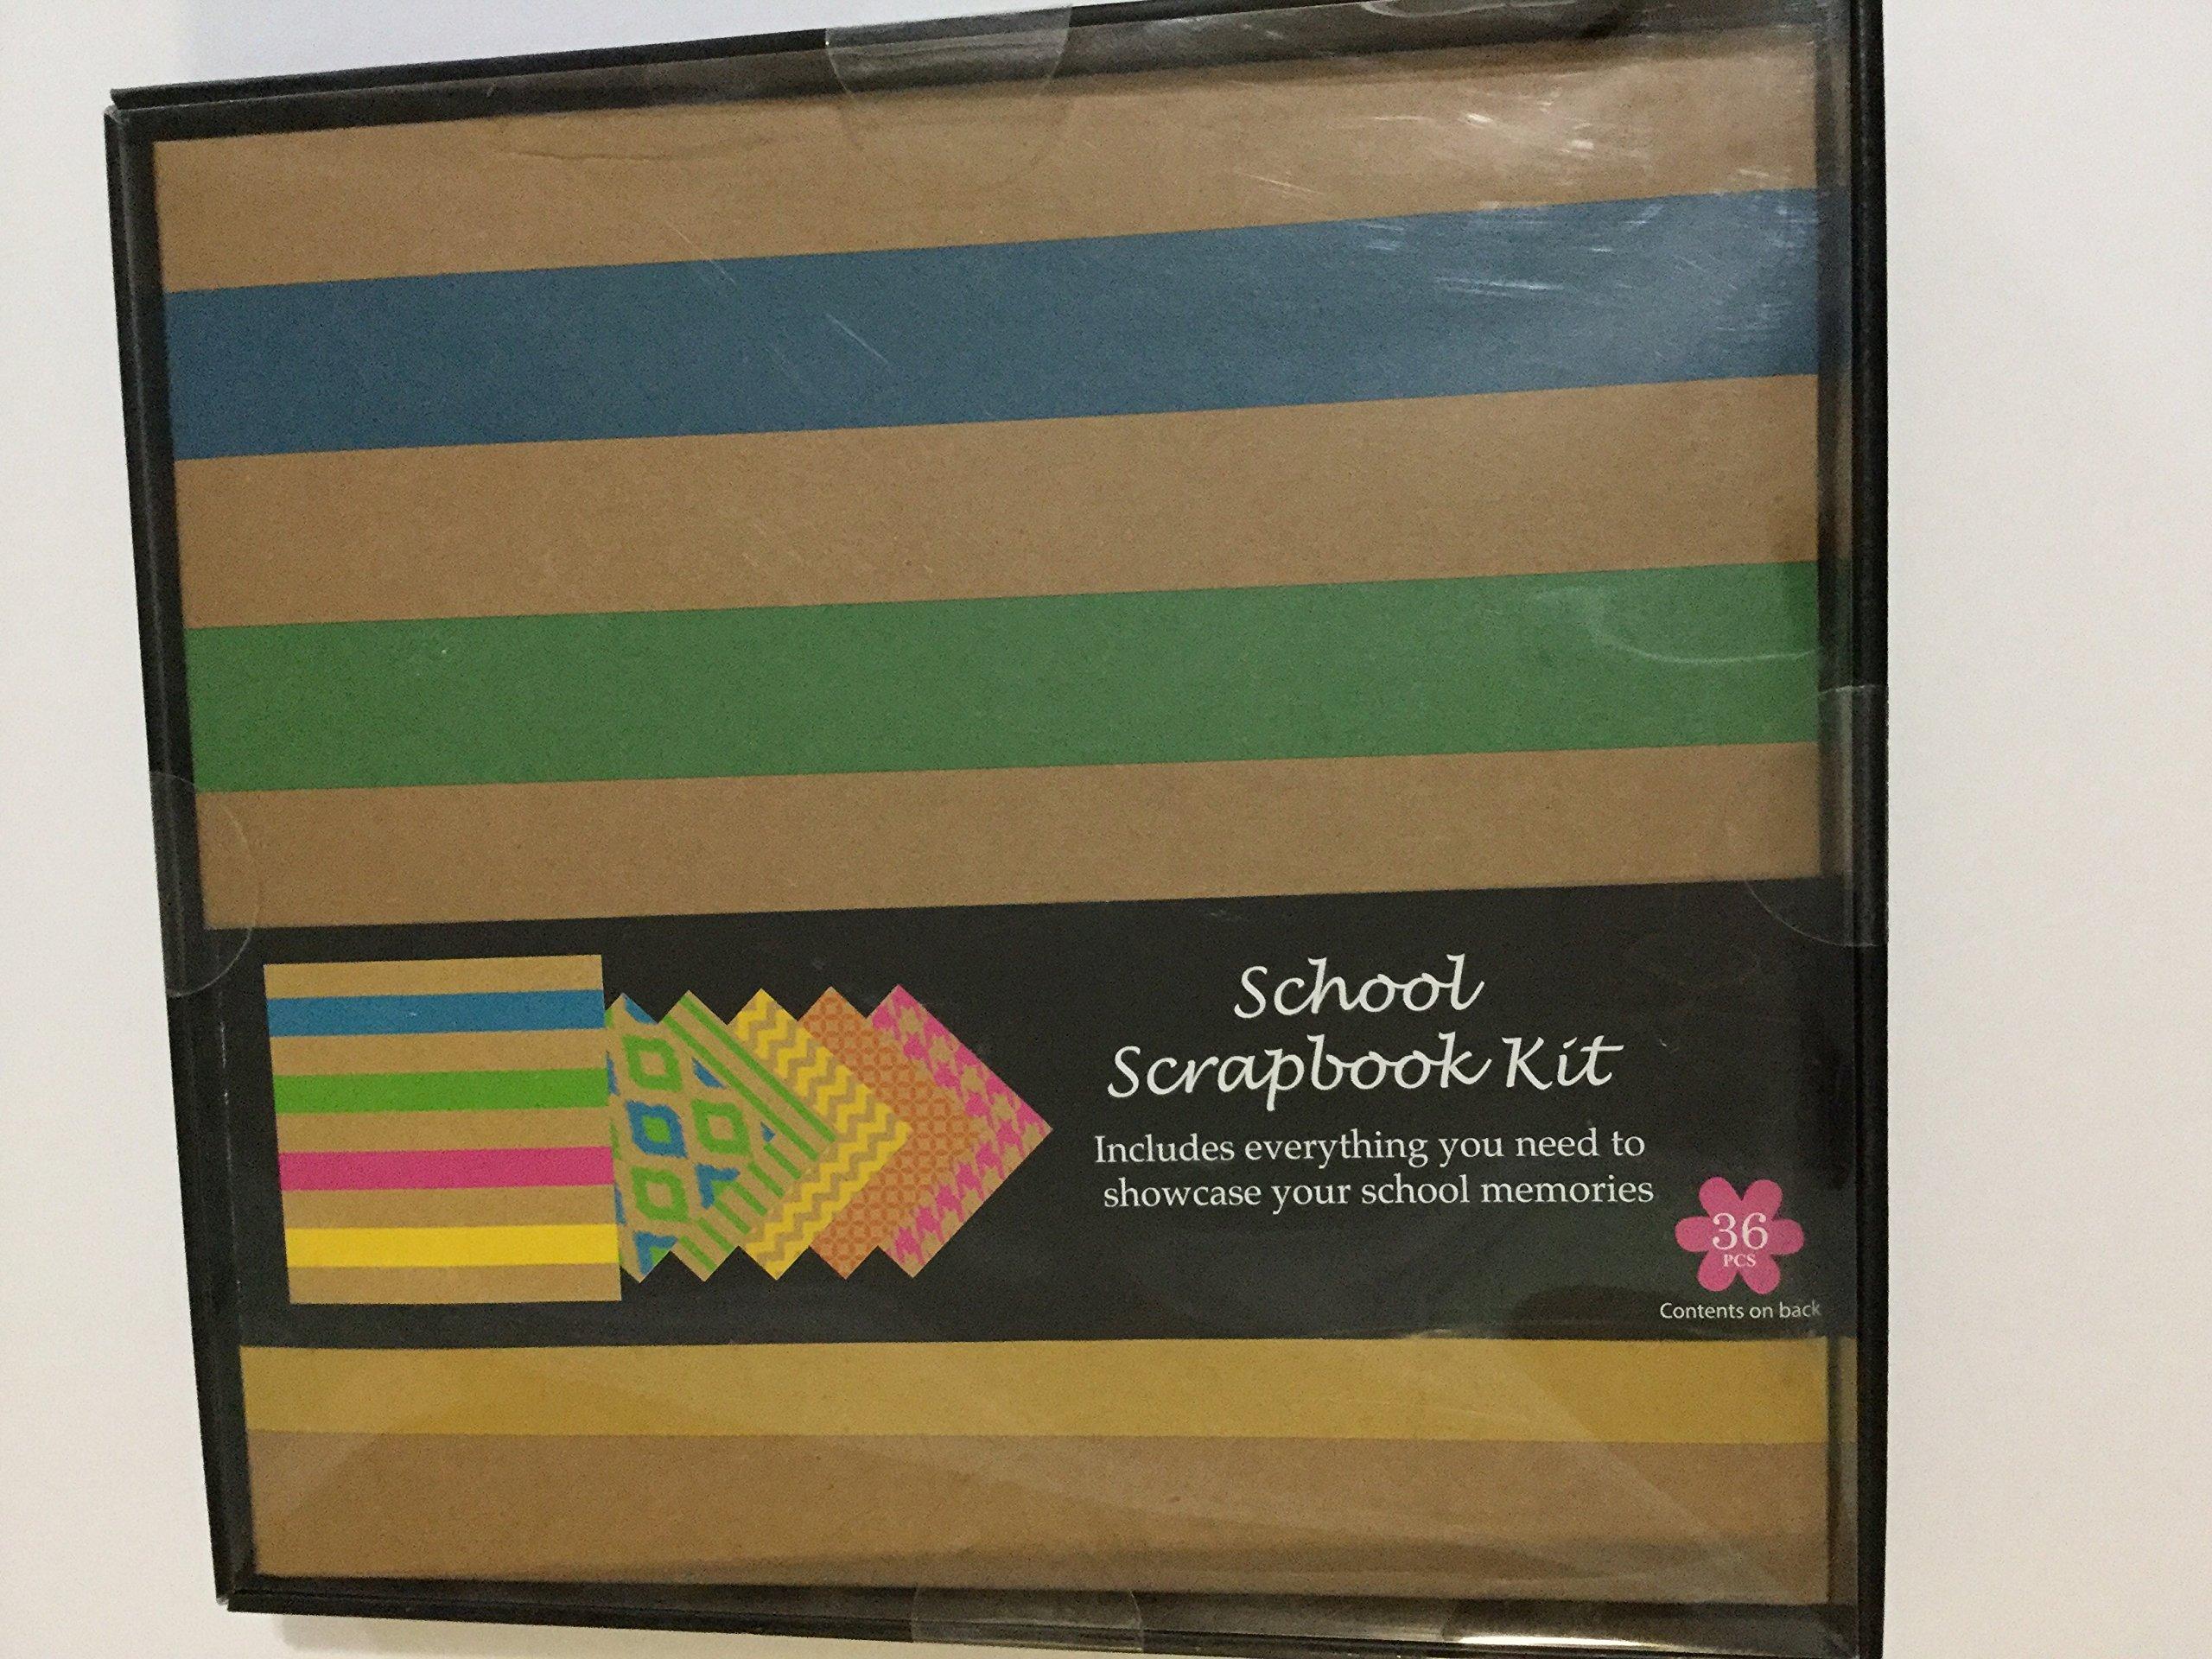 Cheap School Scrapbook Supplies Find School Scrapbook Supplies